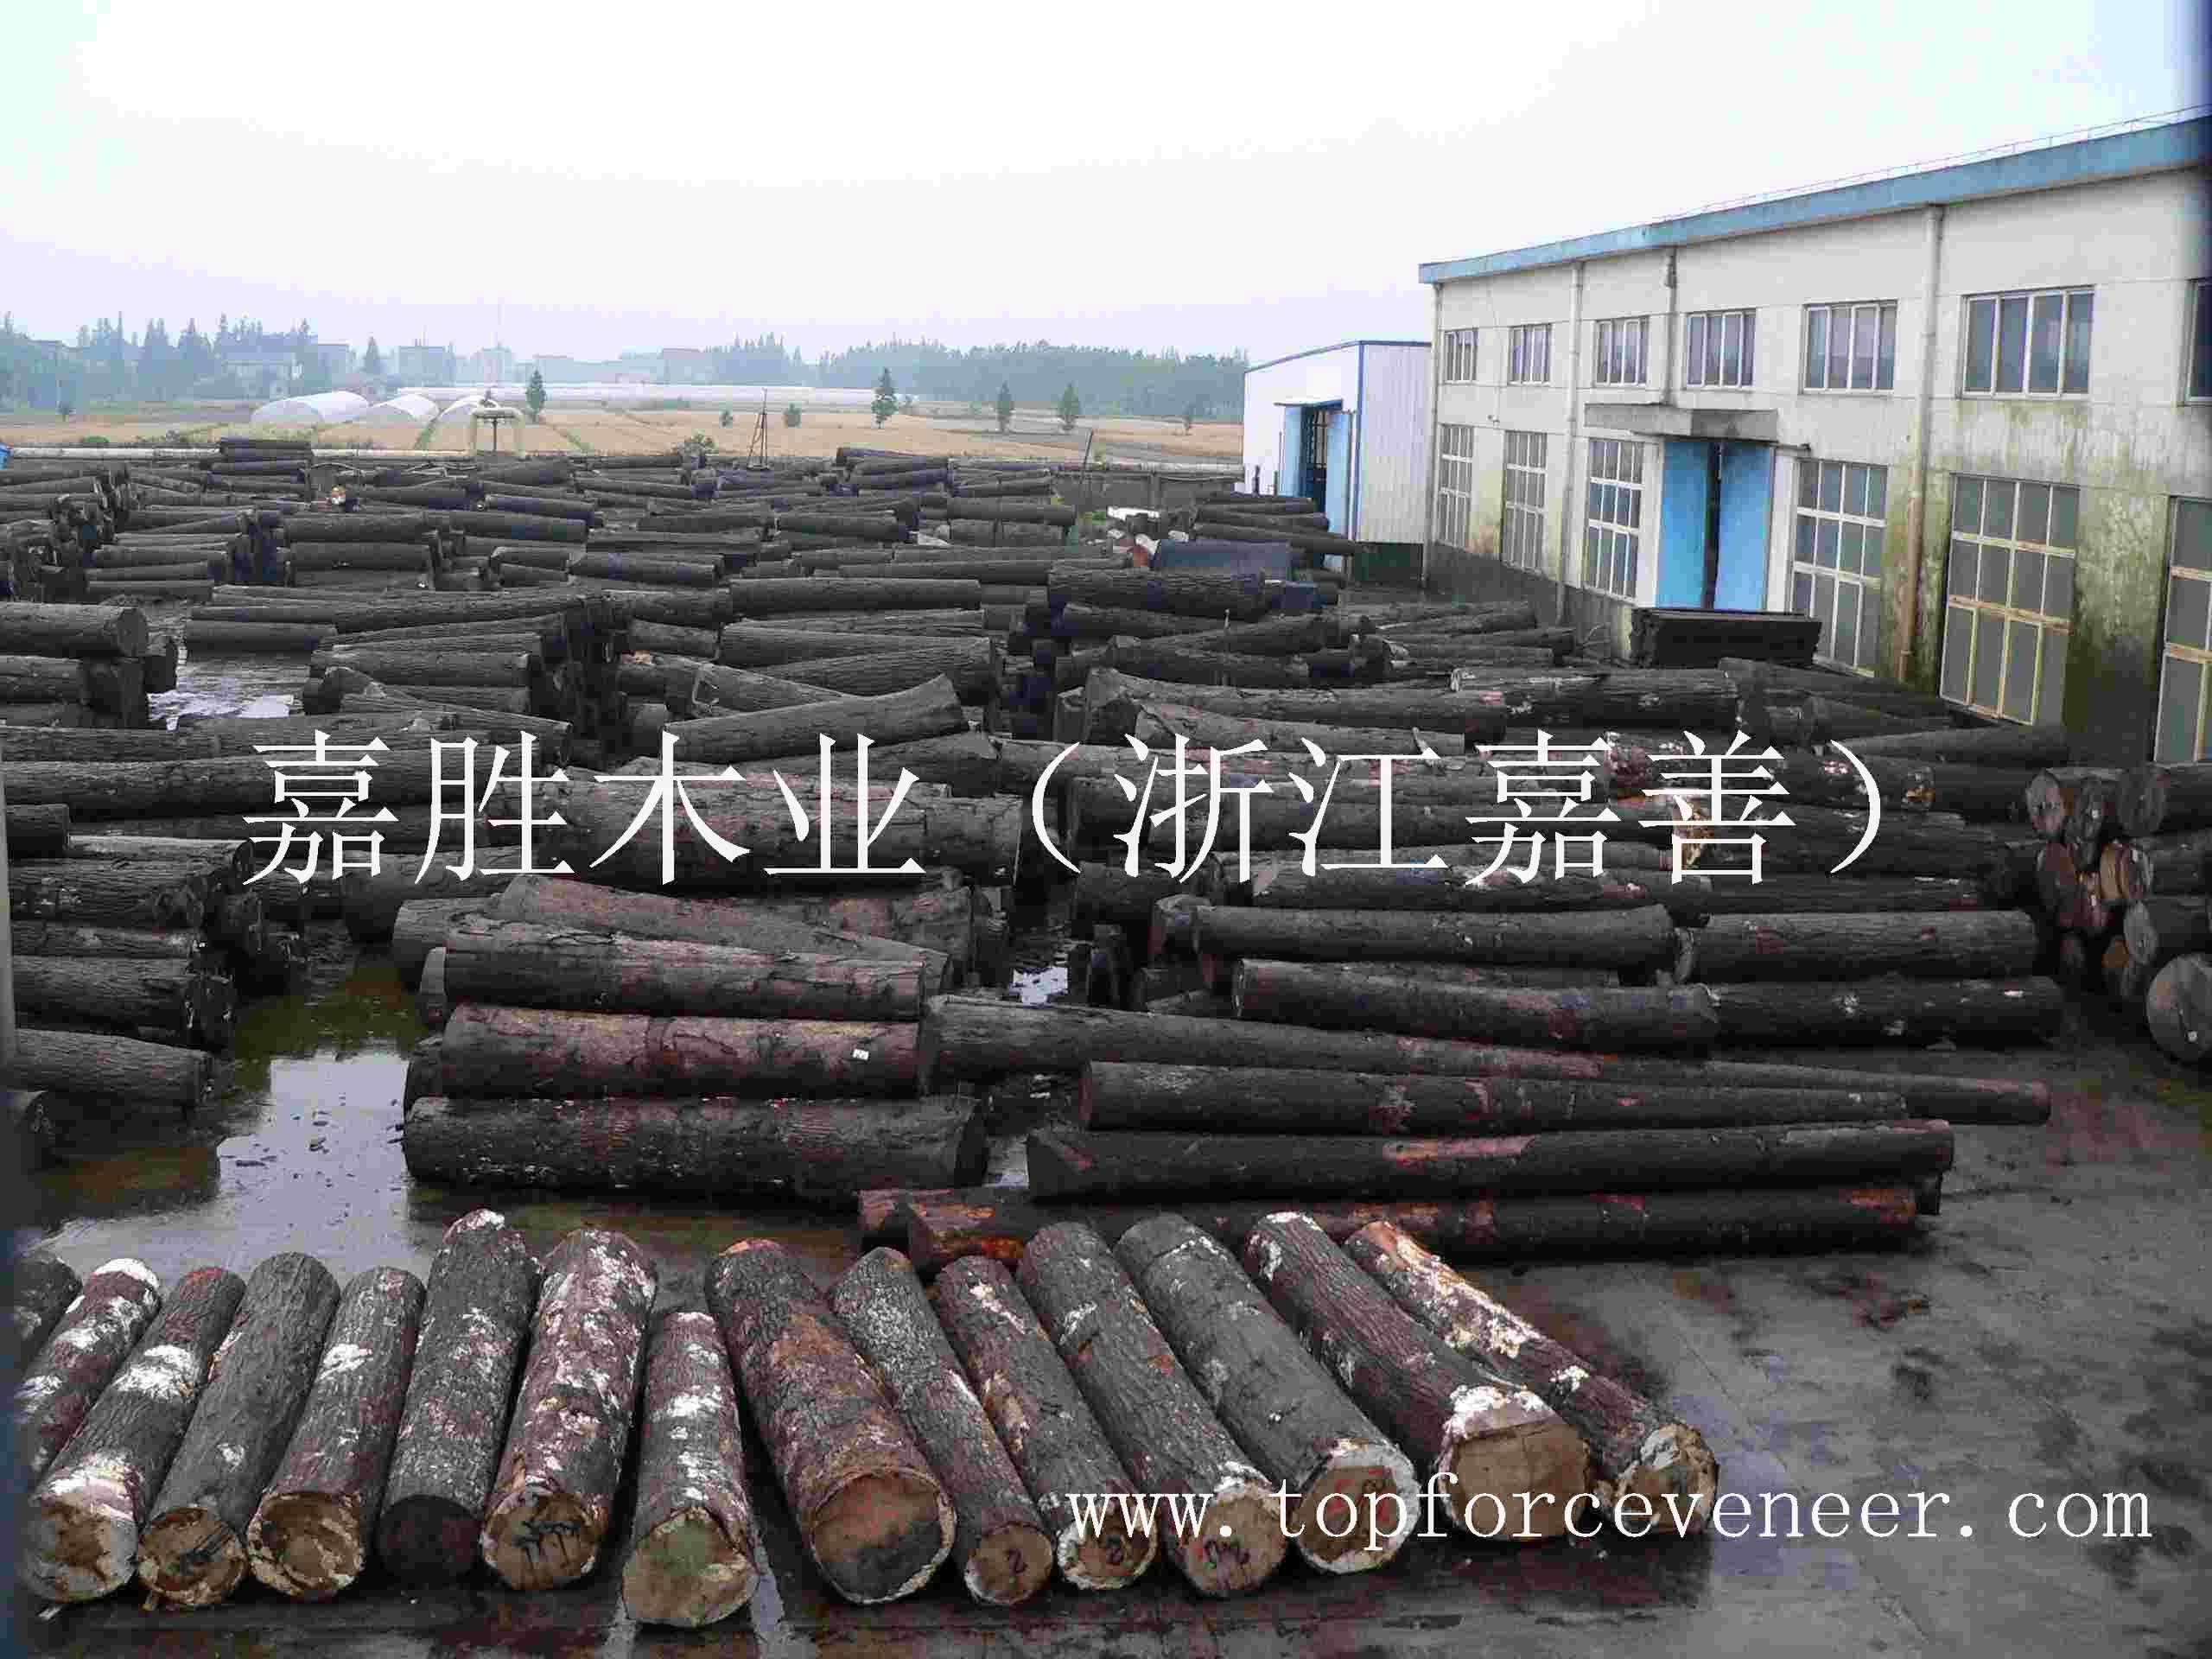 浙江嘉善知名木业厂家 ZheJiang JiaXing JiaShan Reputable Veneer Cutting Slicing Mill Factory